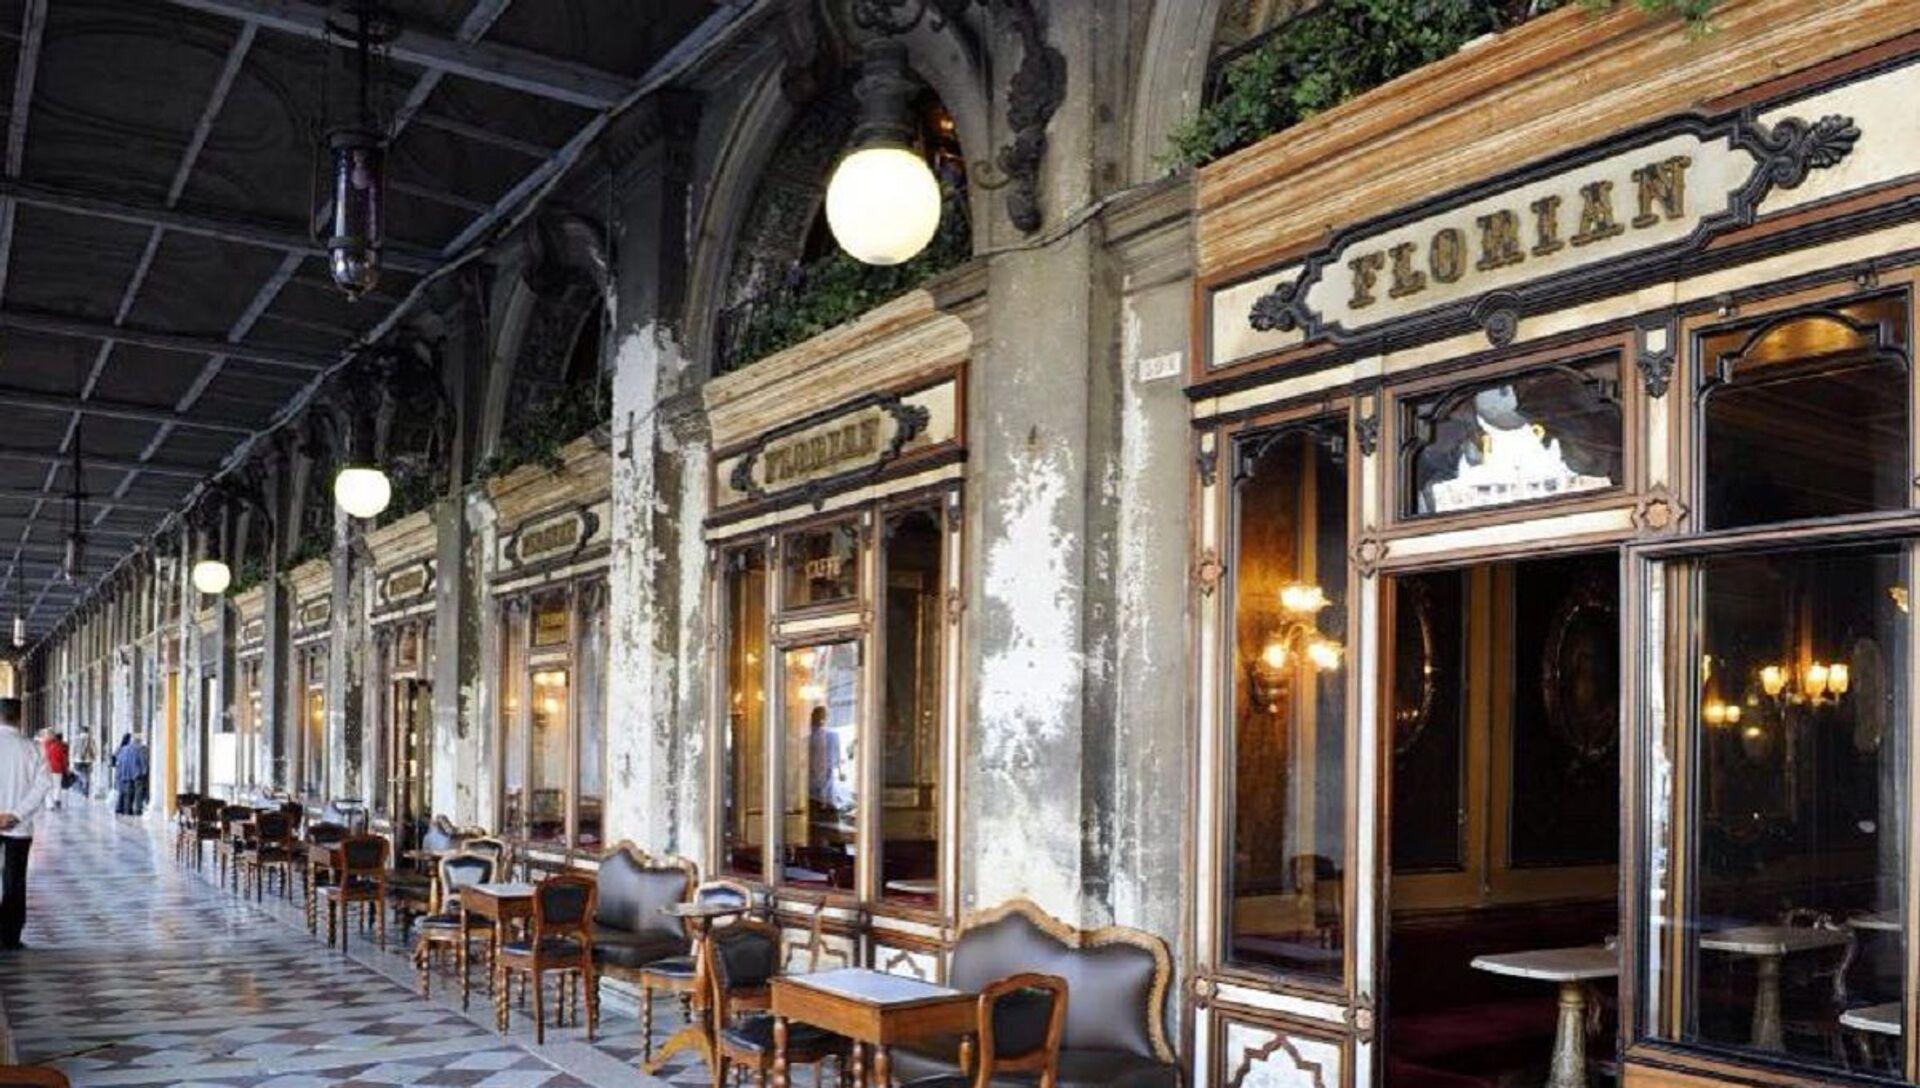 Café Florian en Venecia - Sputnik Mundo, 1920, 21.01.2021